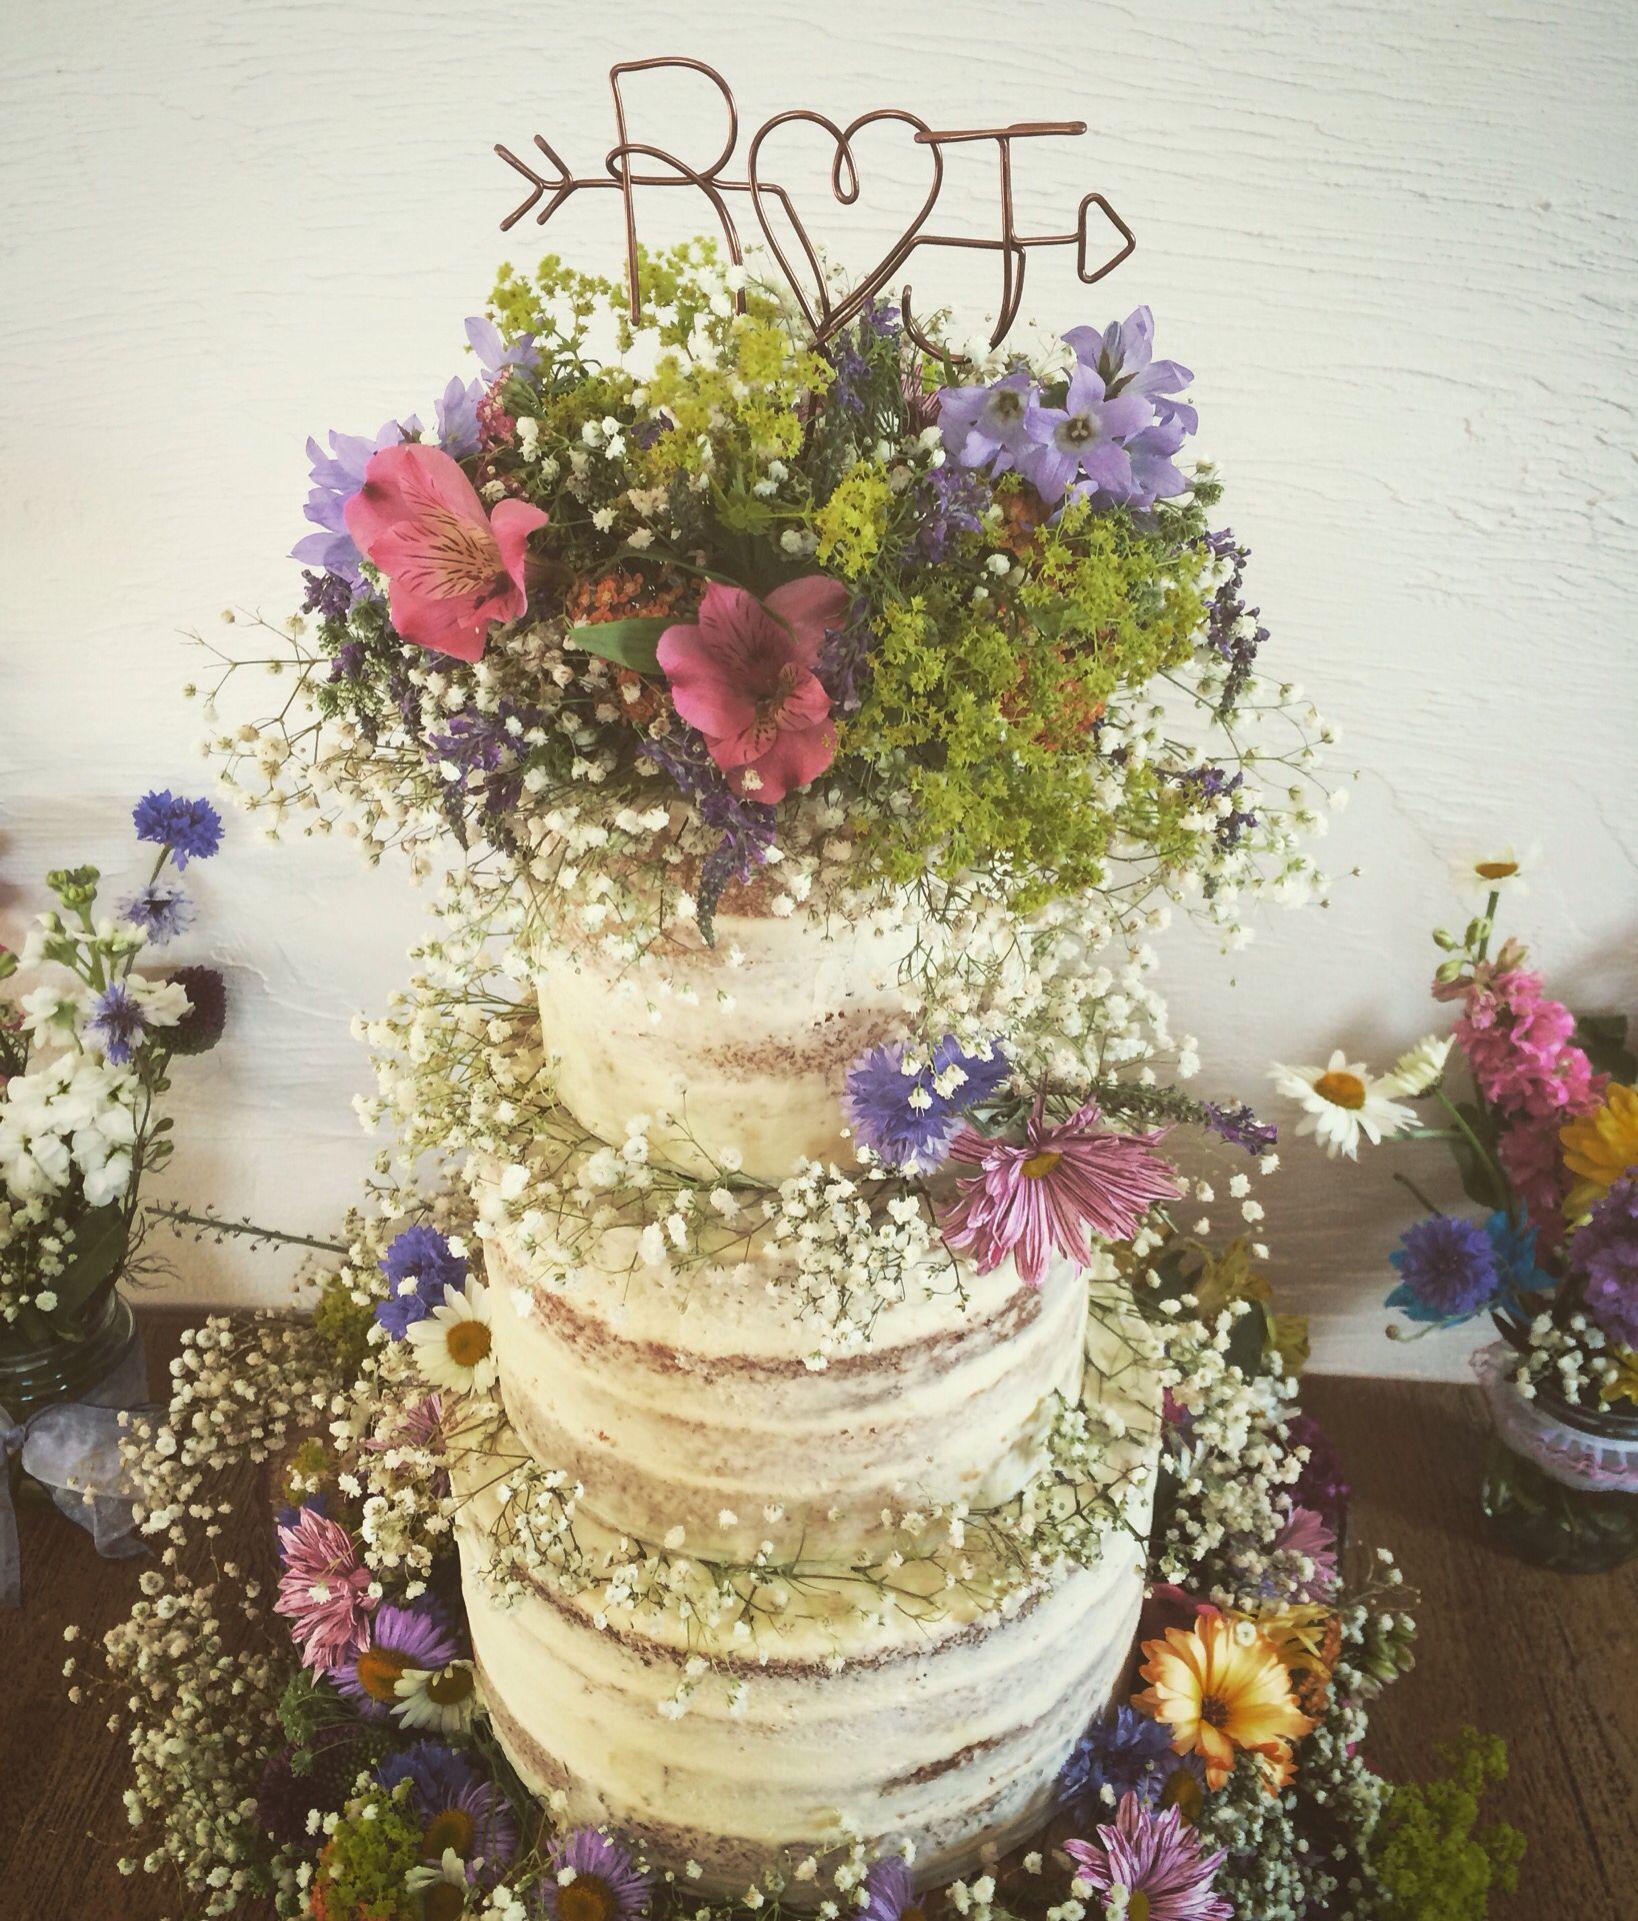 Wild Flowers For Wedding: Rustic Wedding Cake , Semi Naked Wedding Cake With Wild